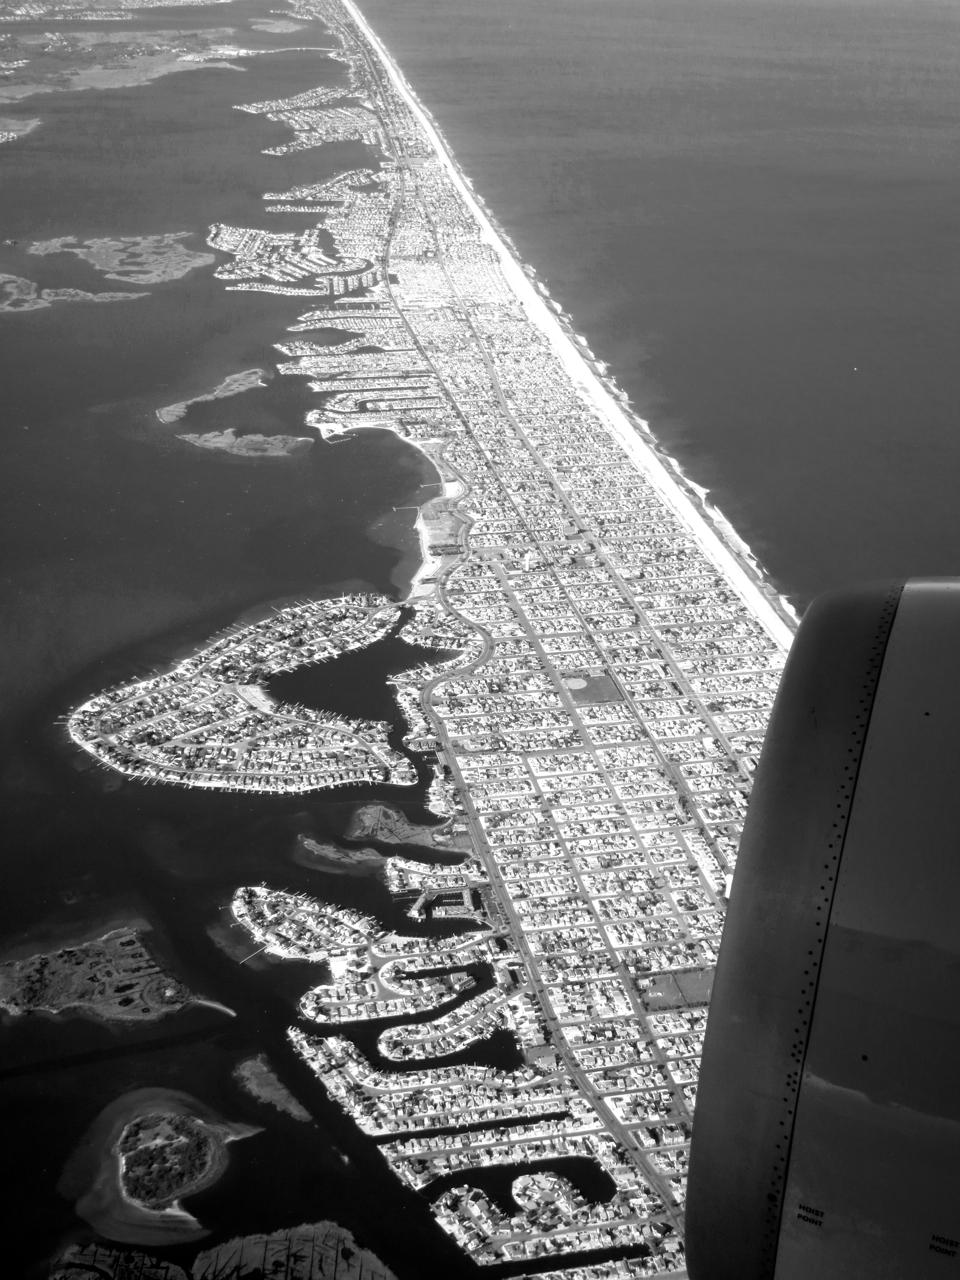 New York aerial photograph